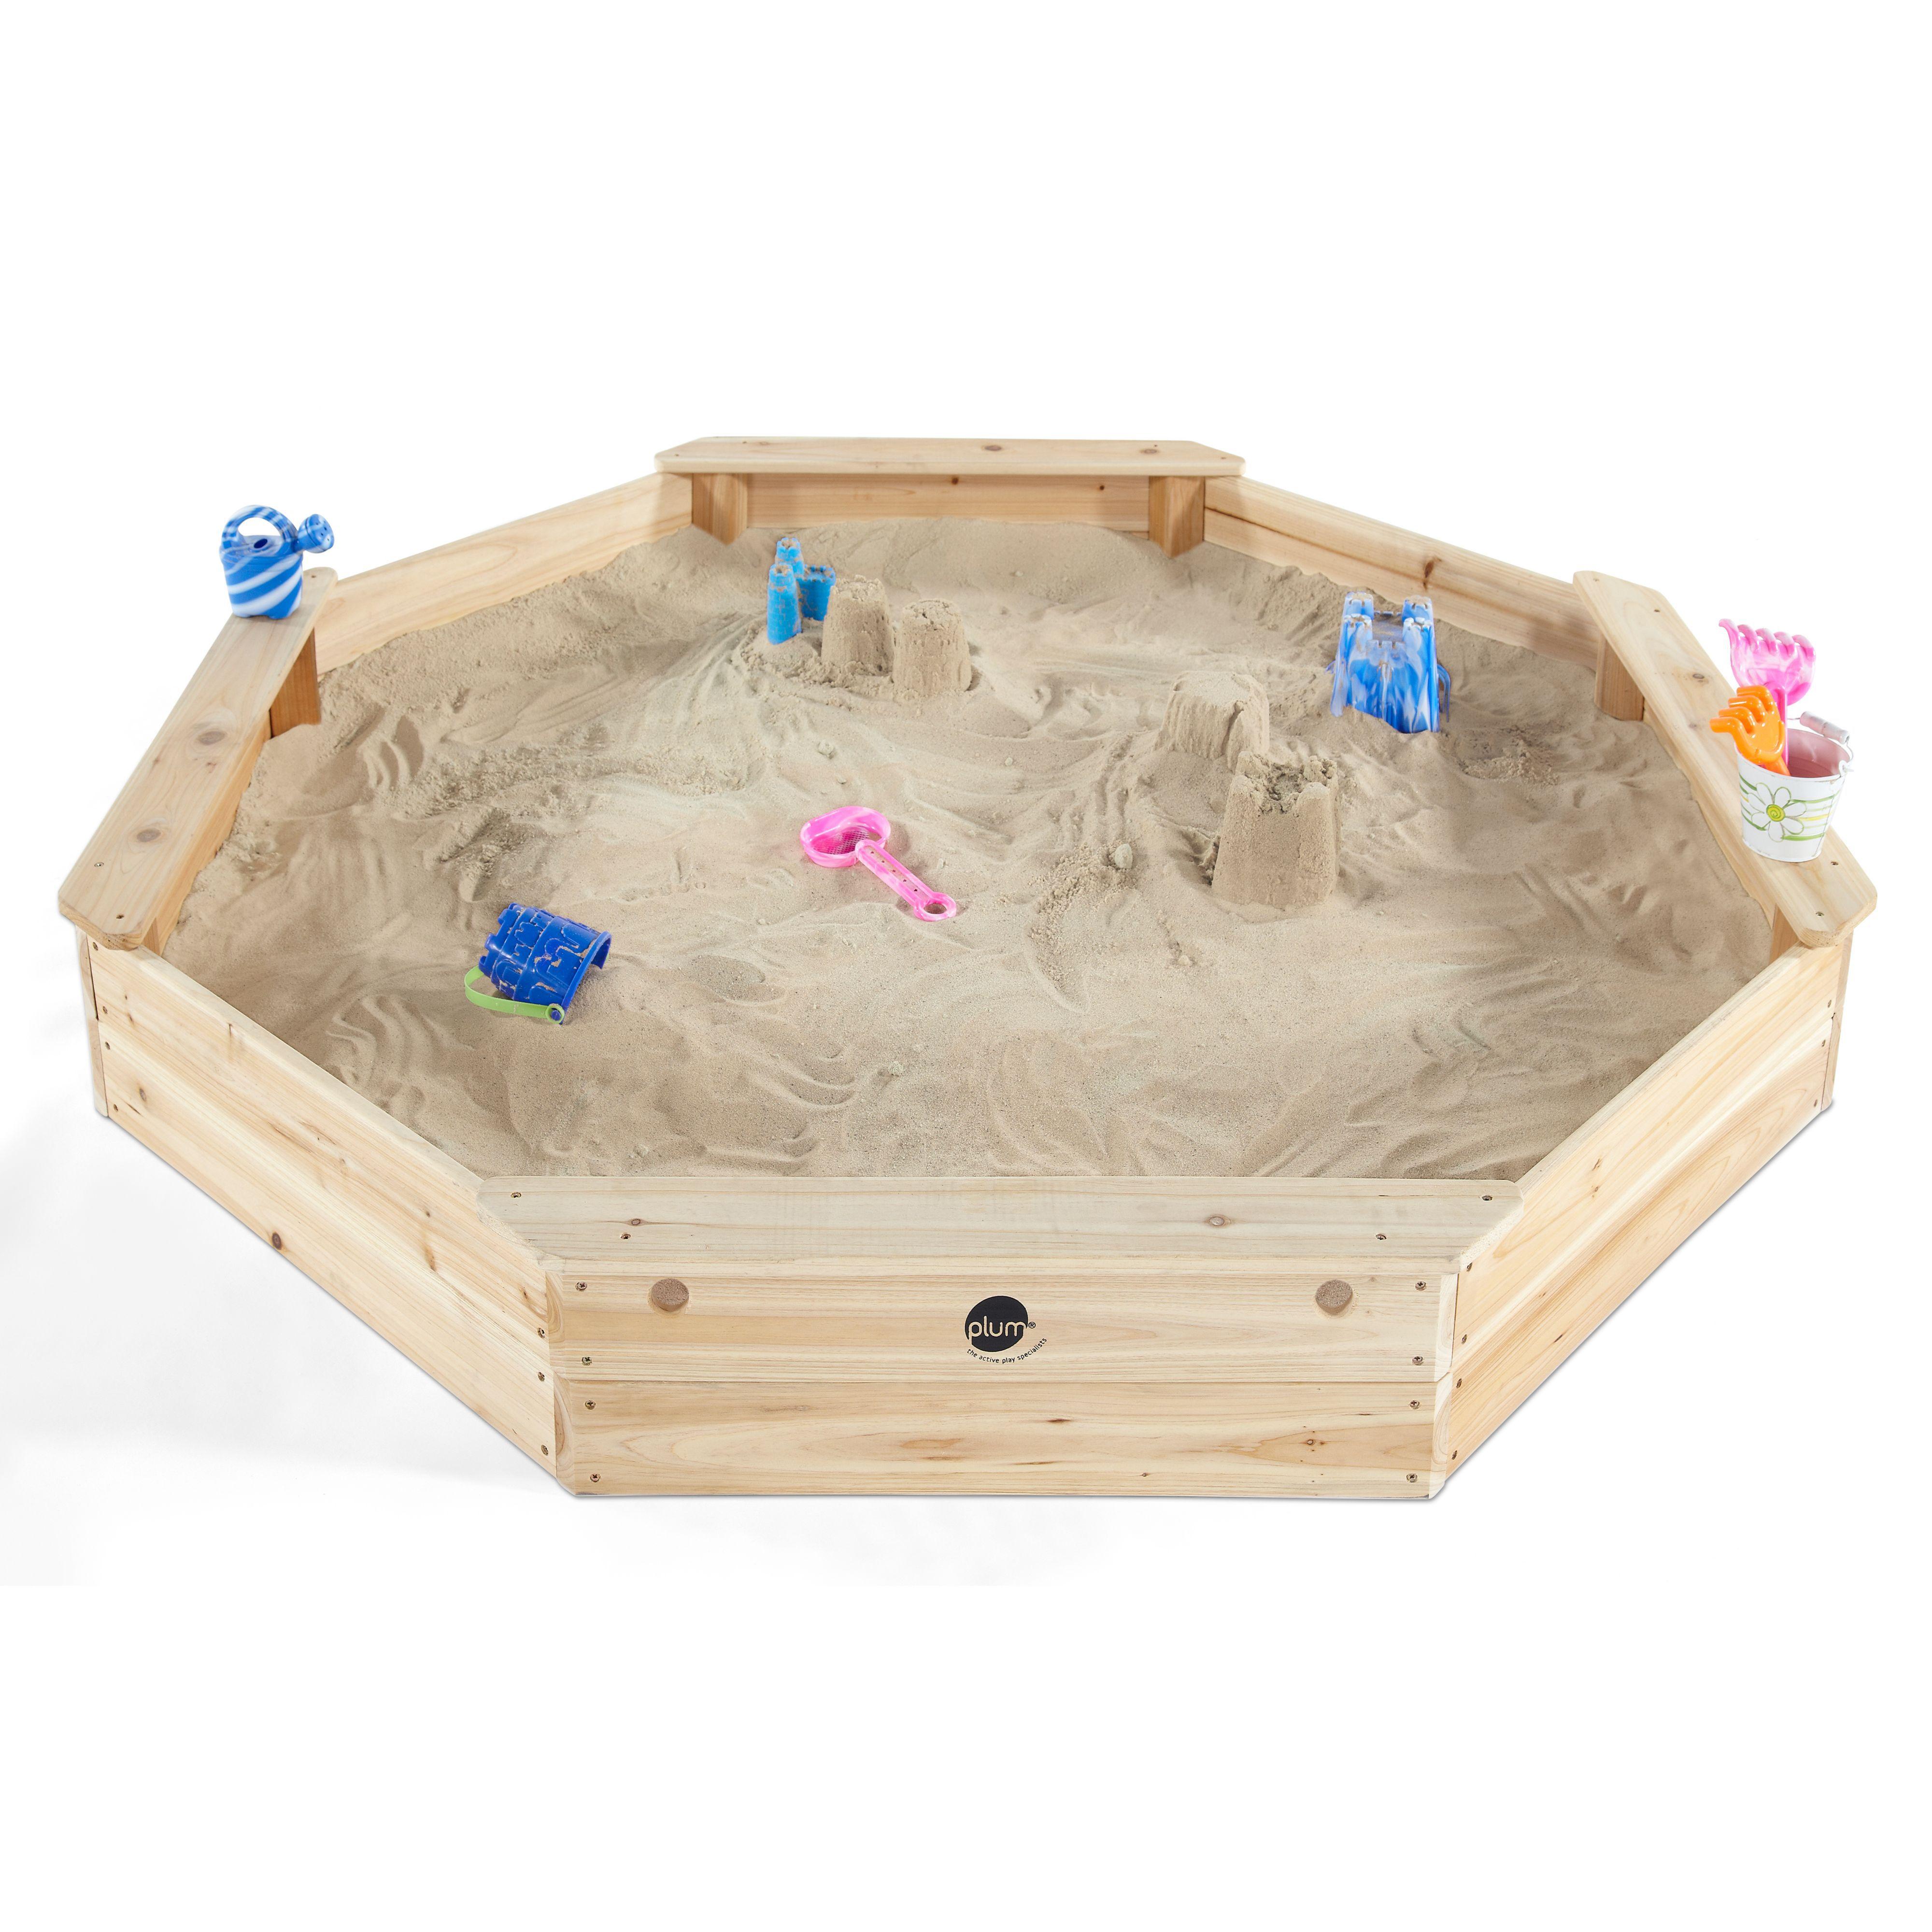 Plum Giant Sand Pit L1.77 x W1.77 x H0.23M